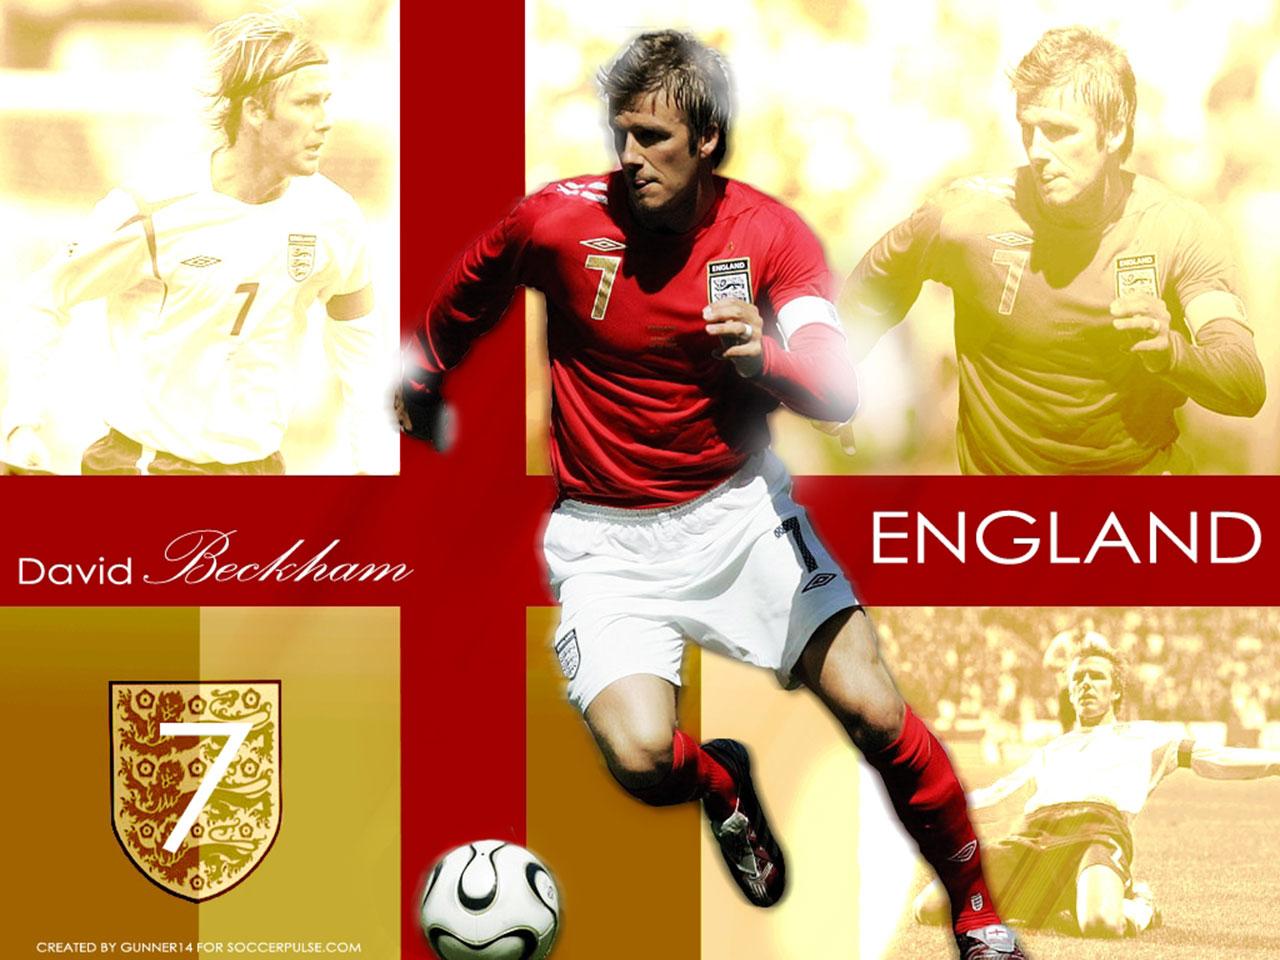 http://3.bp.blogspot.com/-1gRyitwbf0I/UEdh-mW-FVI/AAAAAAAAB6g/RhxY1QUw1KQ/s1600/David-Beckham-England-Team-Wallpaper.jpg